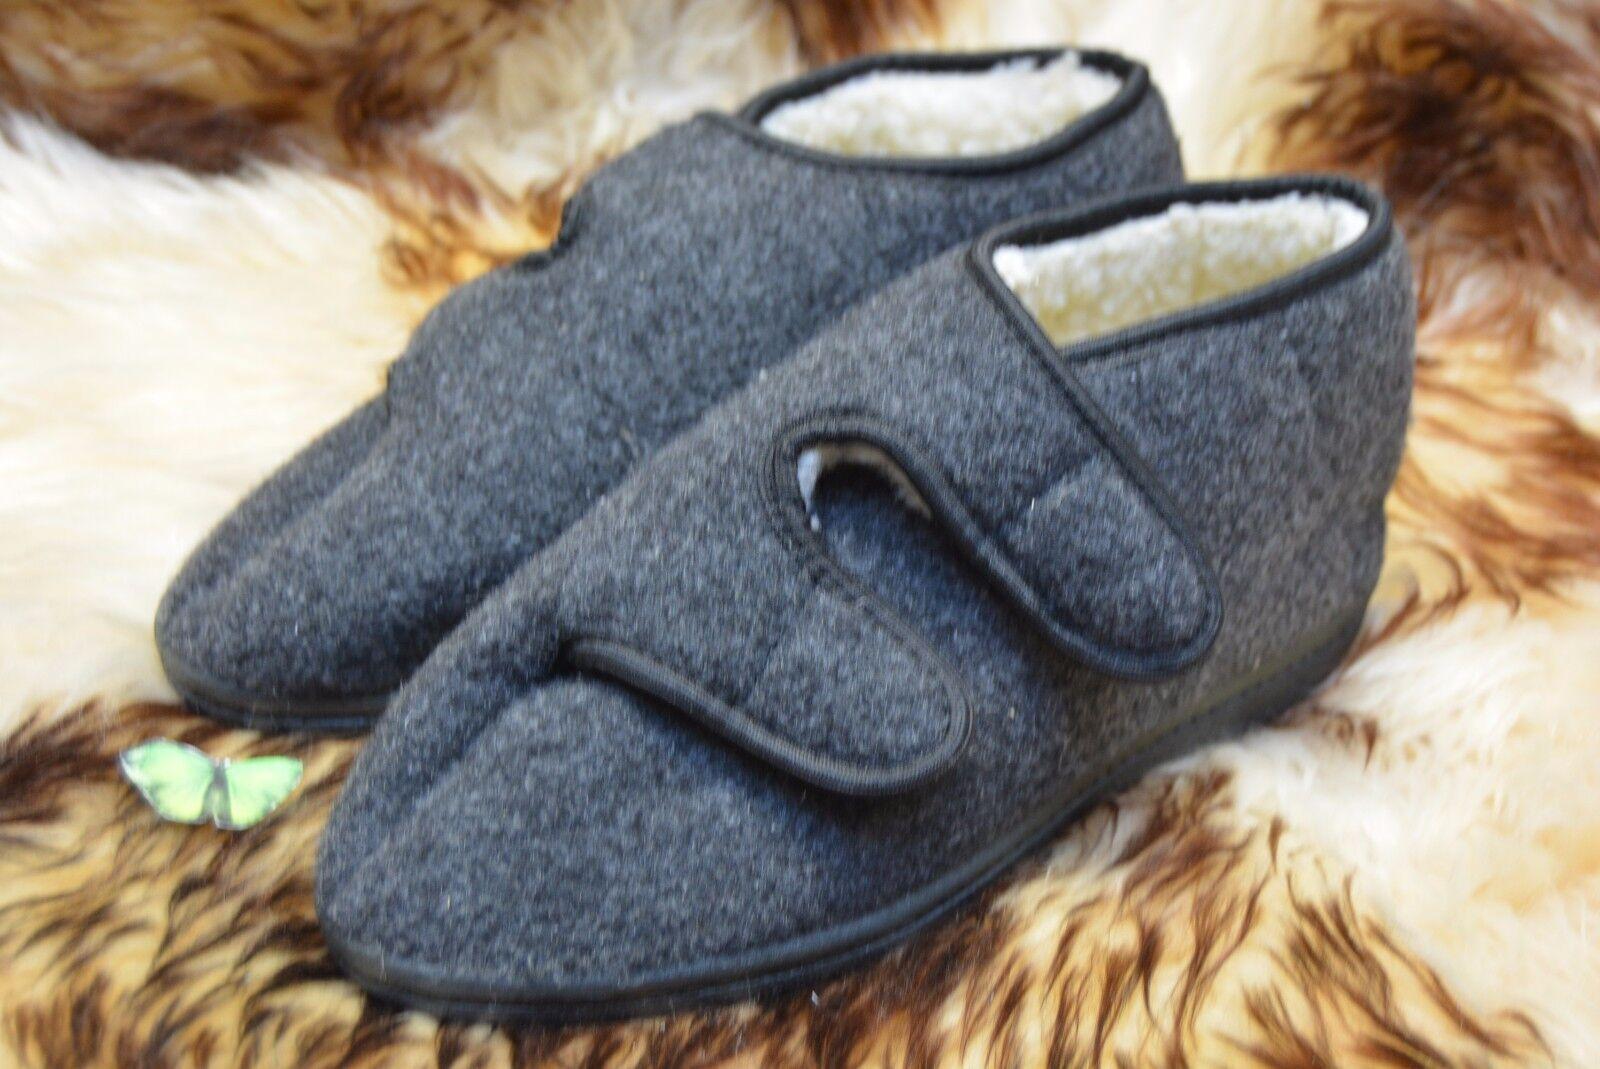 Hombre  sheeps wool / felt Talla slippers Botas very warm Talla felt 7-12 c3befd